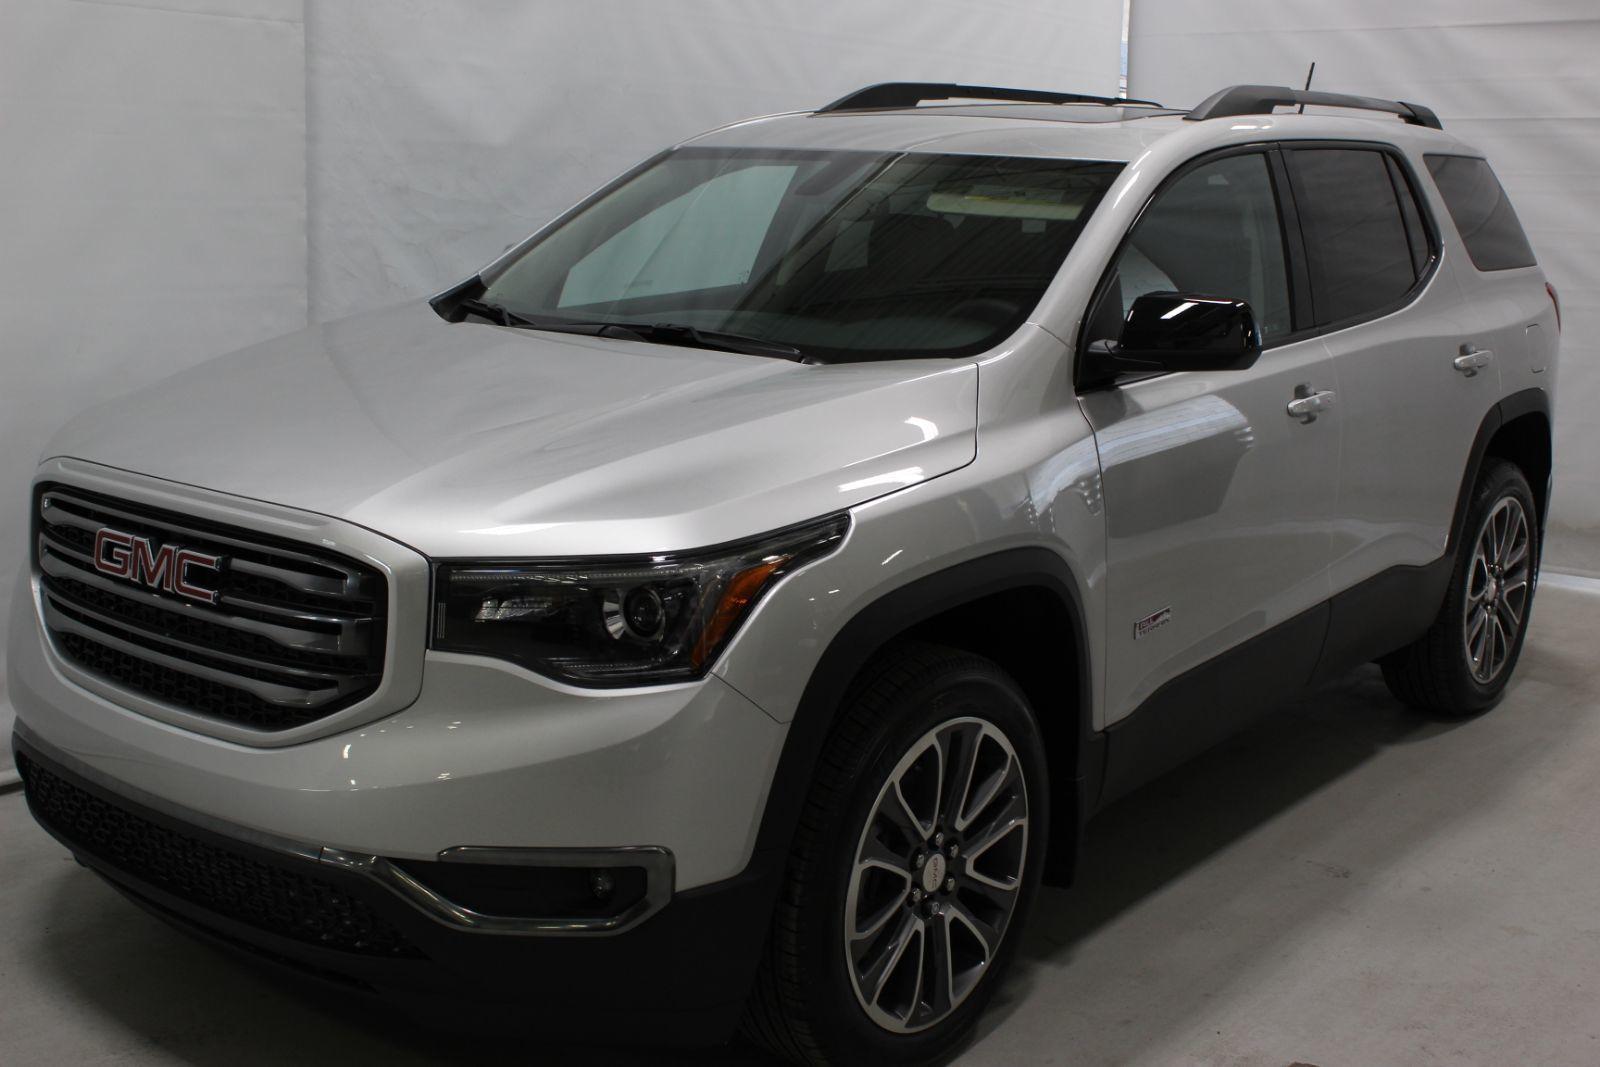 New 2019 GMC Acadia SLT, Automatique, AWD Quicksiler ...